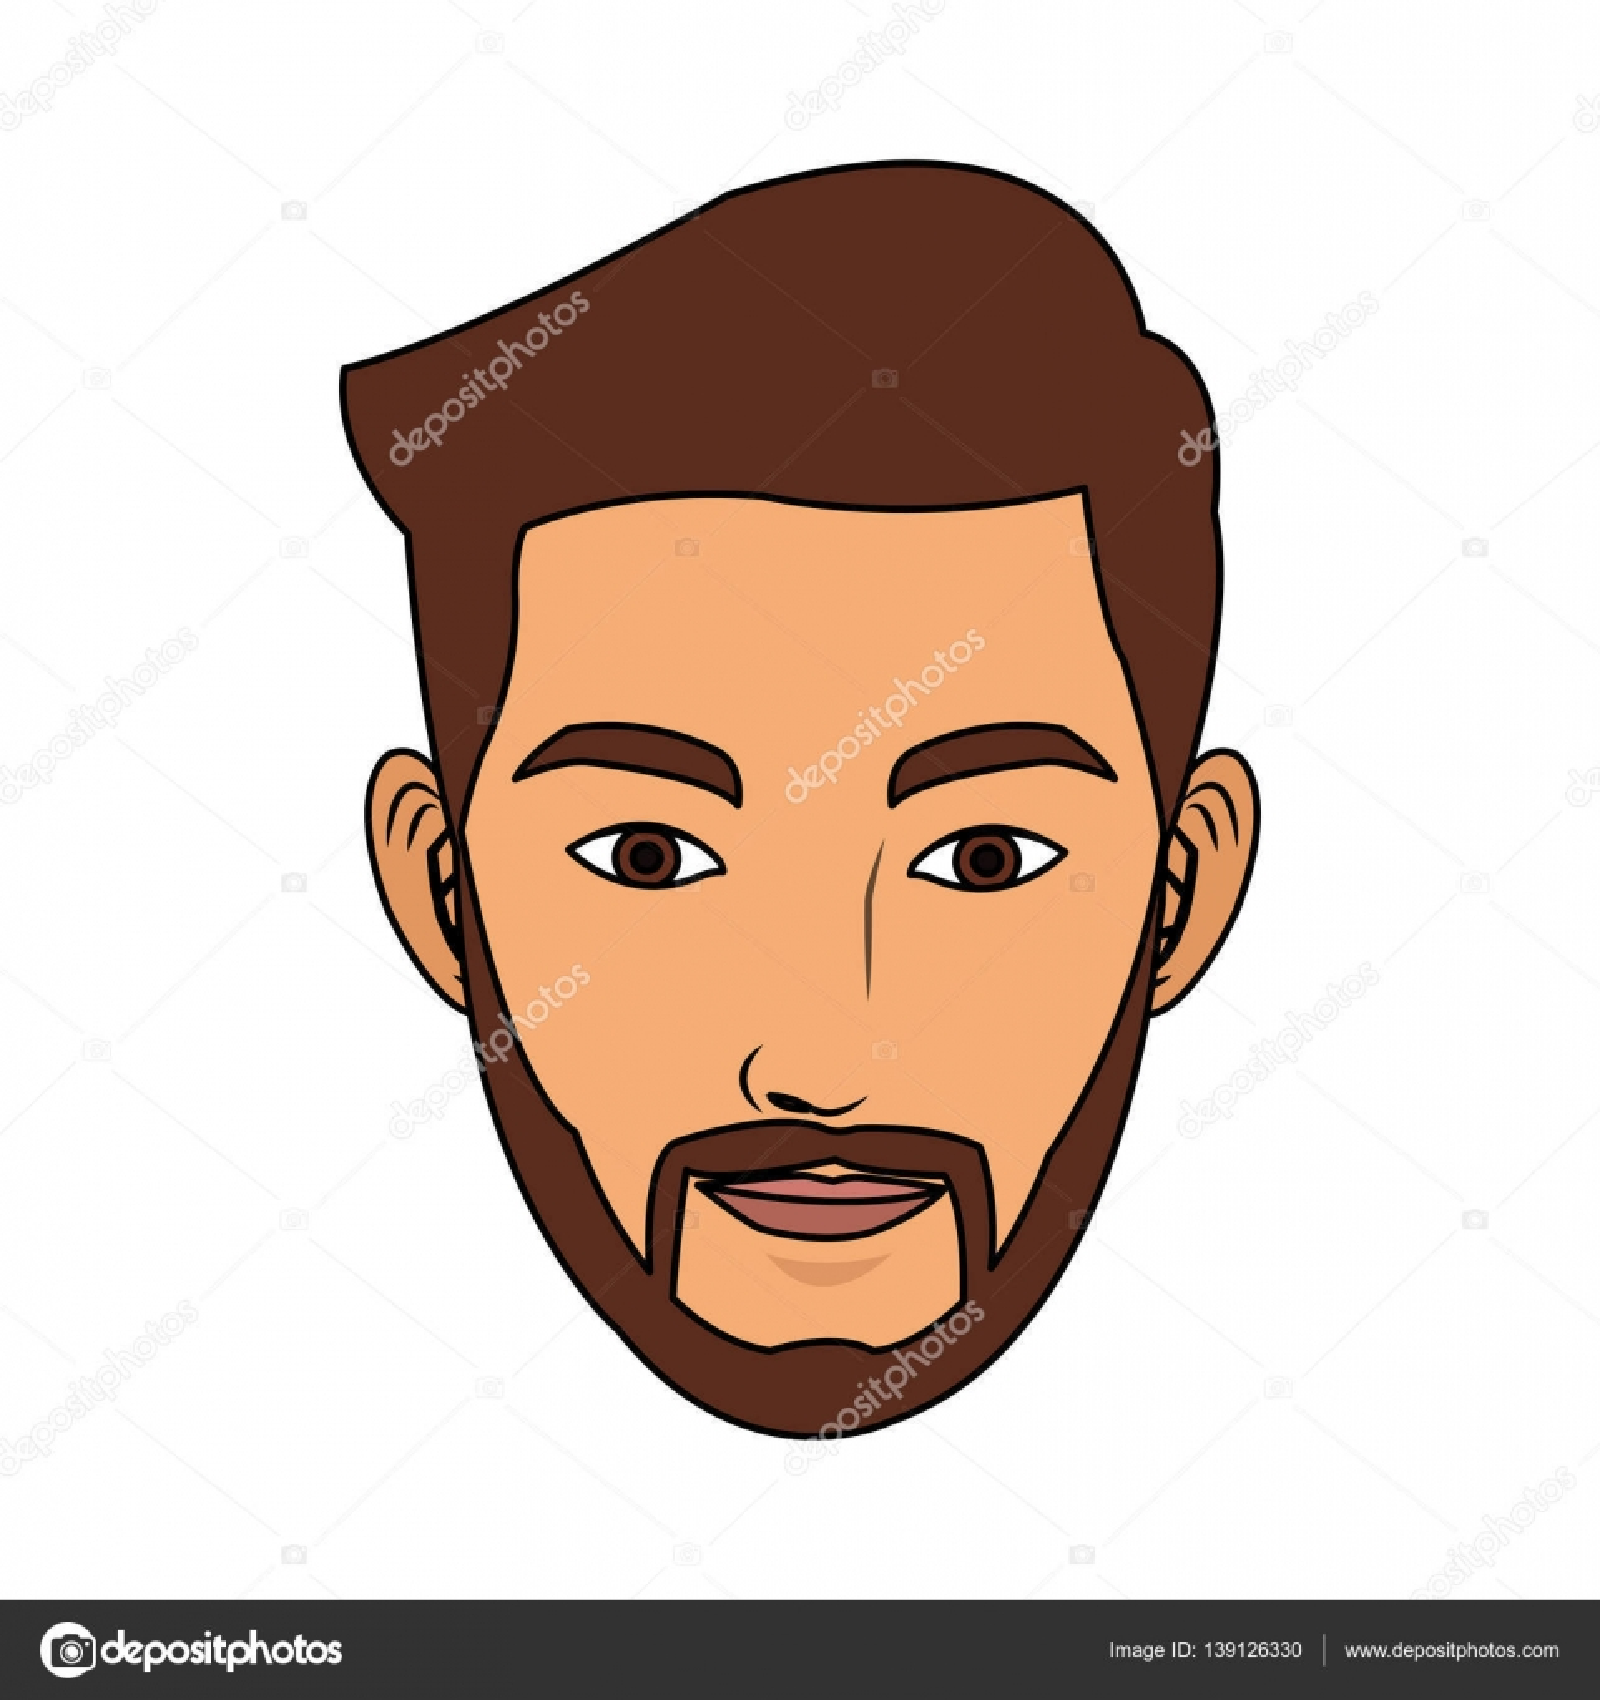 Man Cartoon Icon Stock Vector C Jemastock 139126330